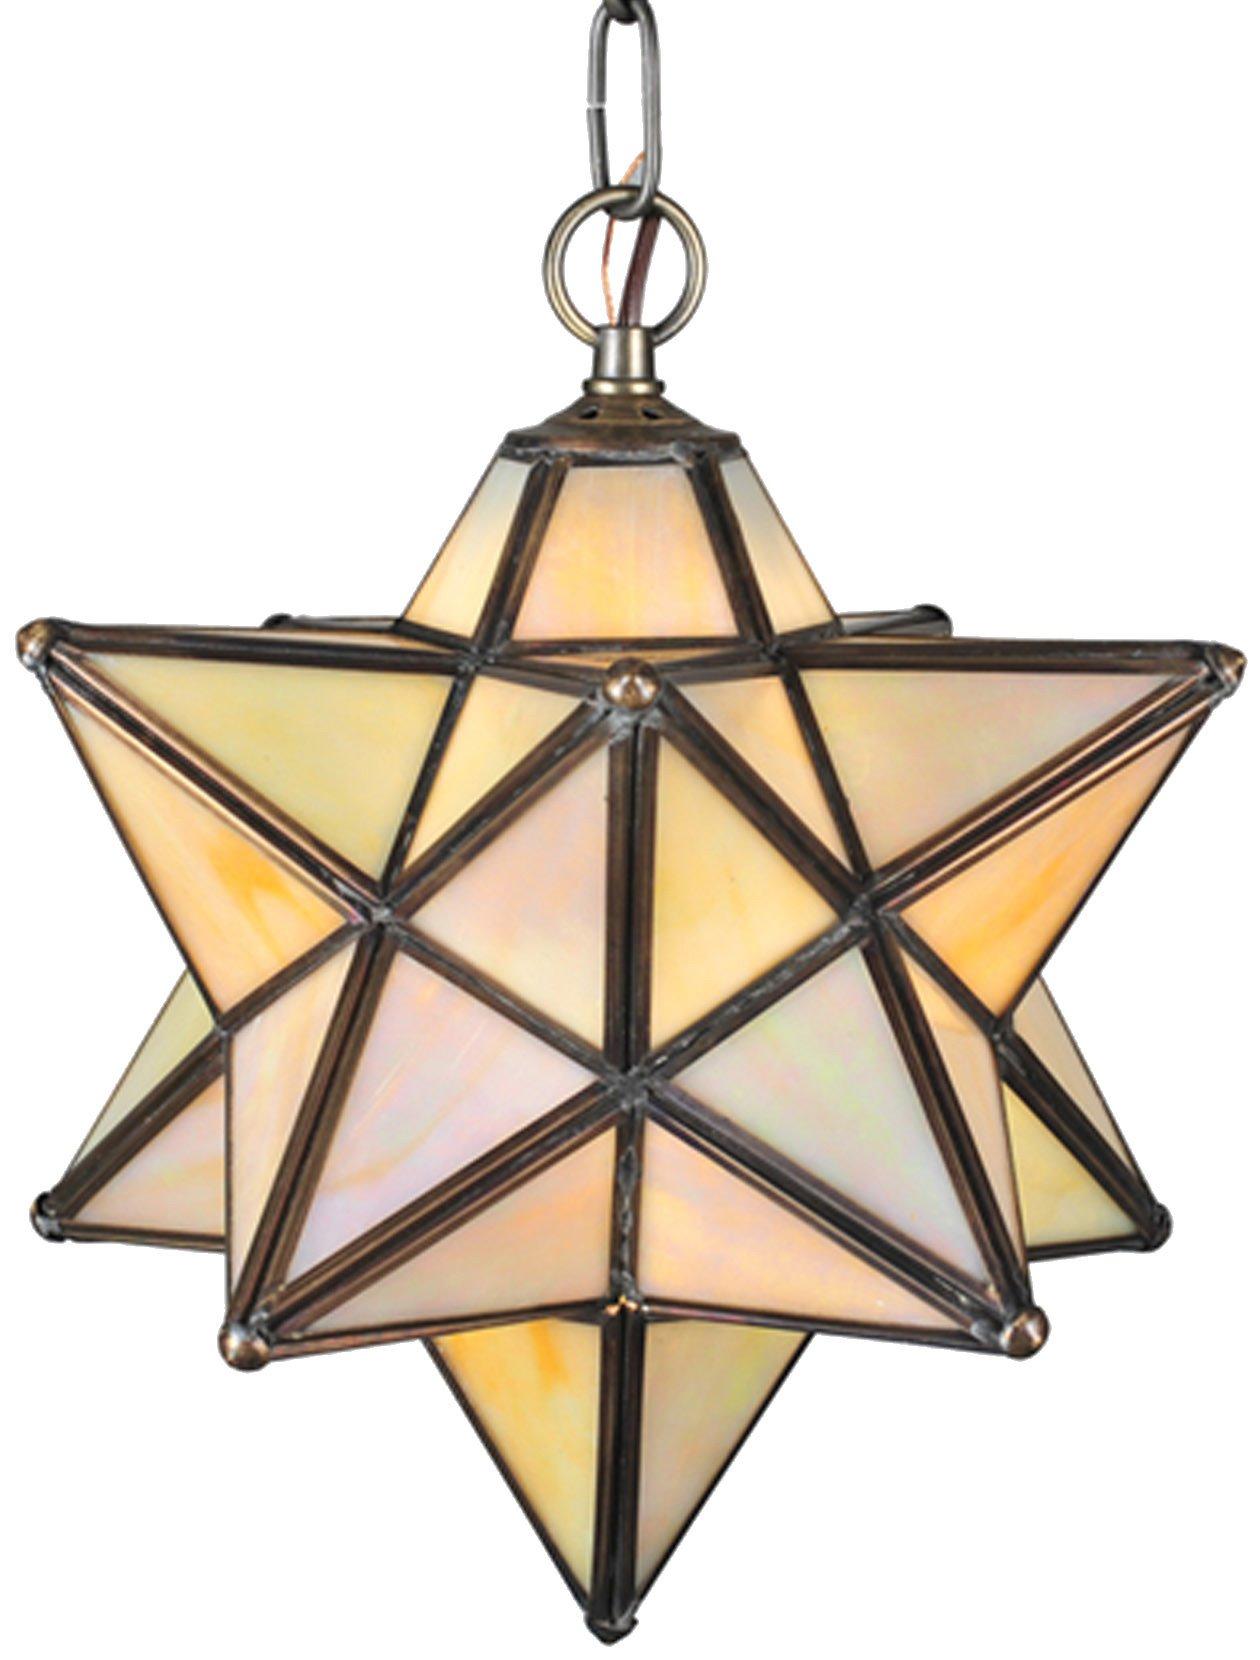 Meyda Tiffany 12123 Moravian Star 9 Modern Contemporary